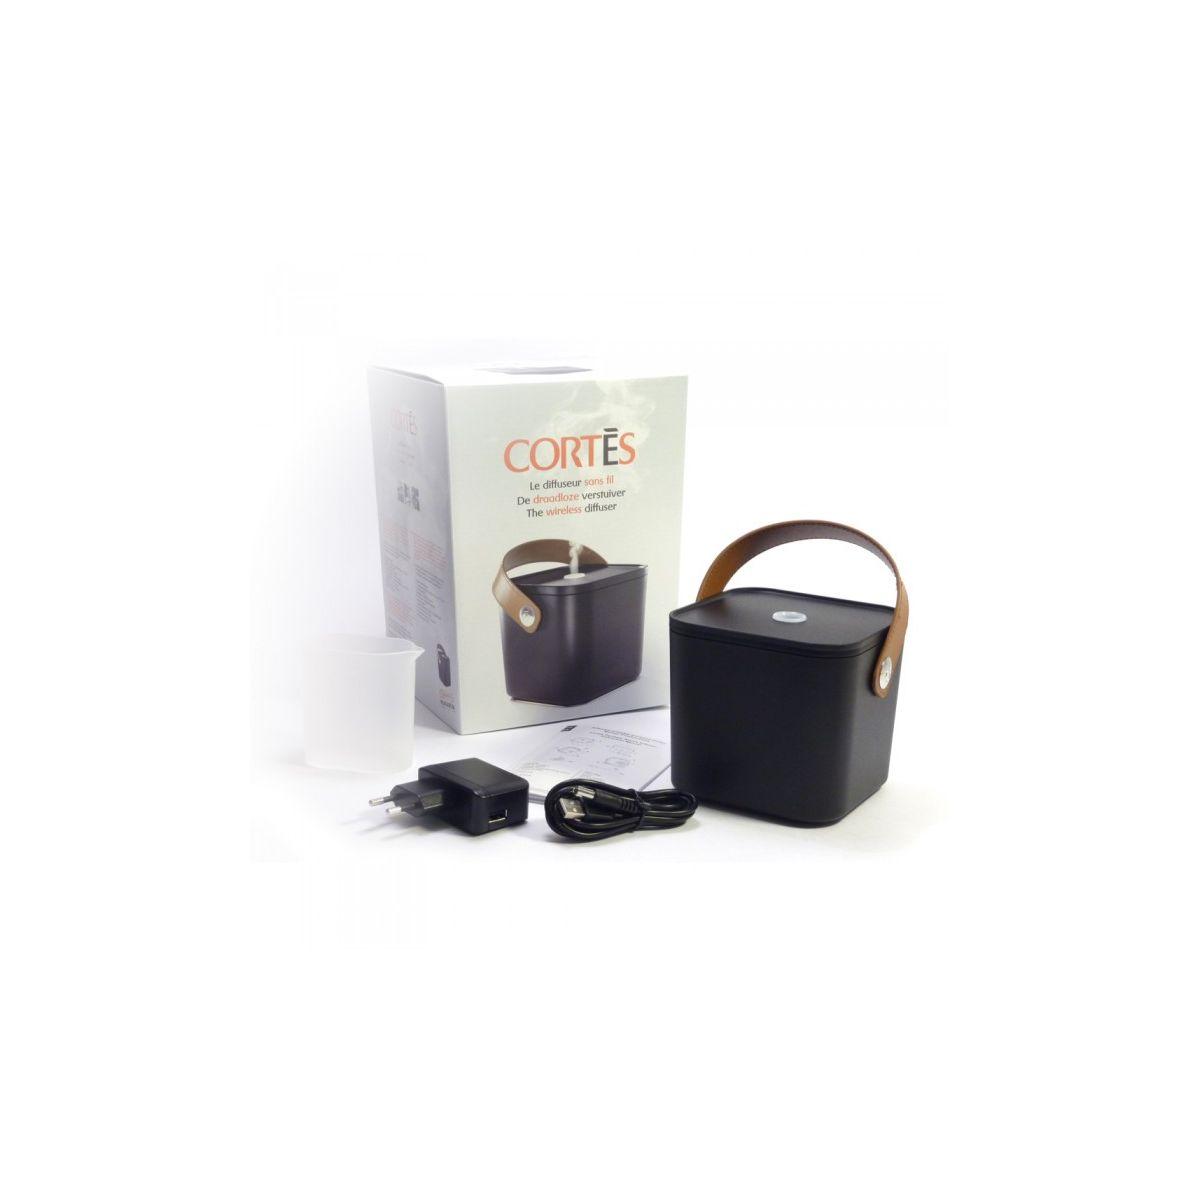 diffuseur ultrasonique d 39 huiles essentielles sans fil cortes sebio. Black Bedroom Furniture Sets. Home Design Ideas